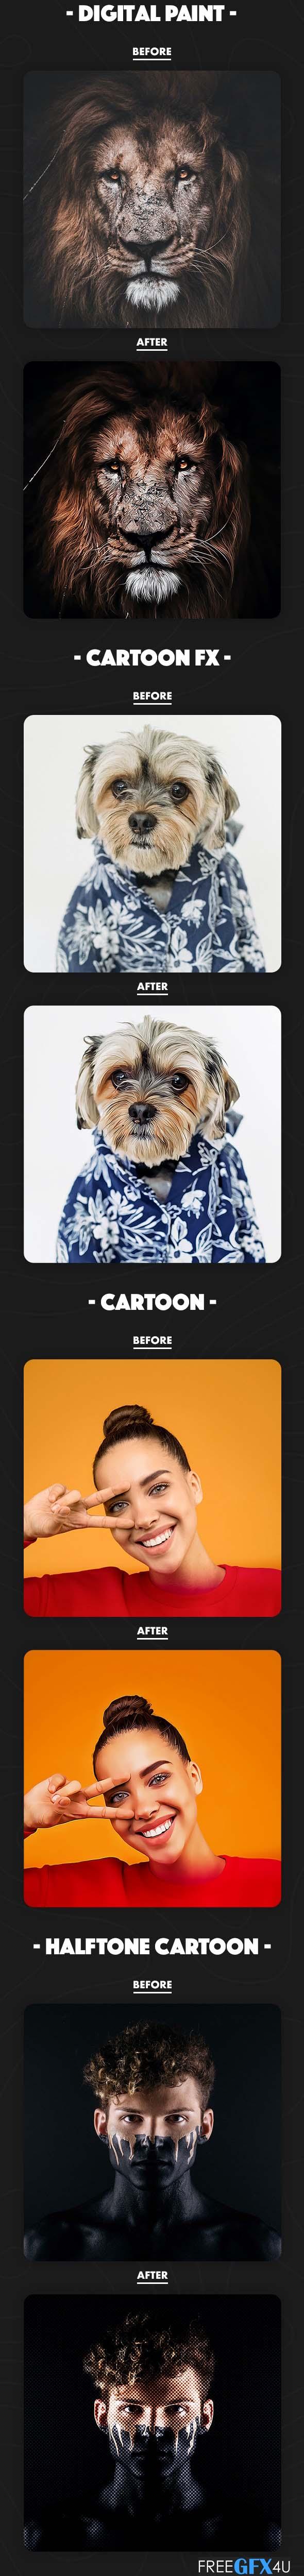 4 in 1 Cartoon Bundle Photoshop Actions